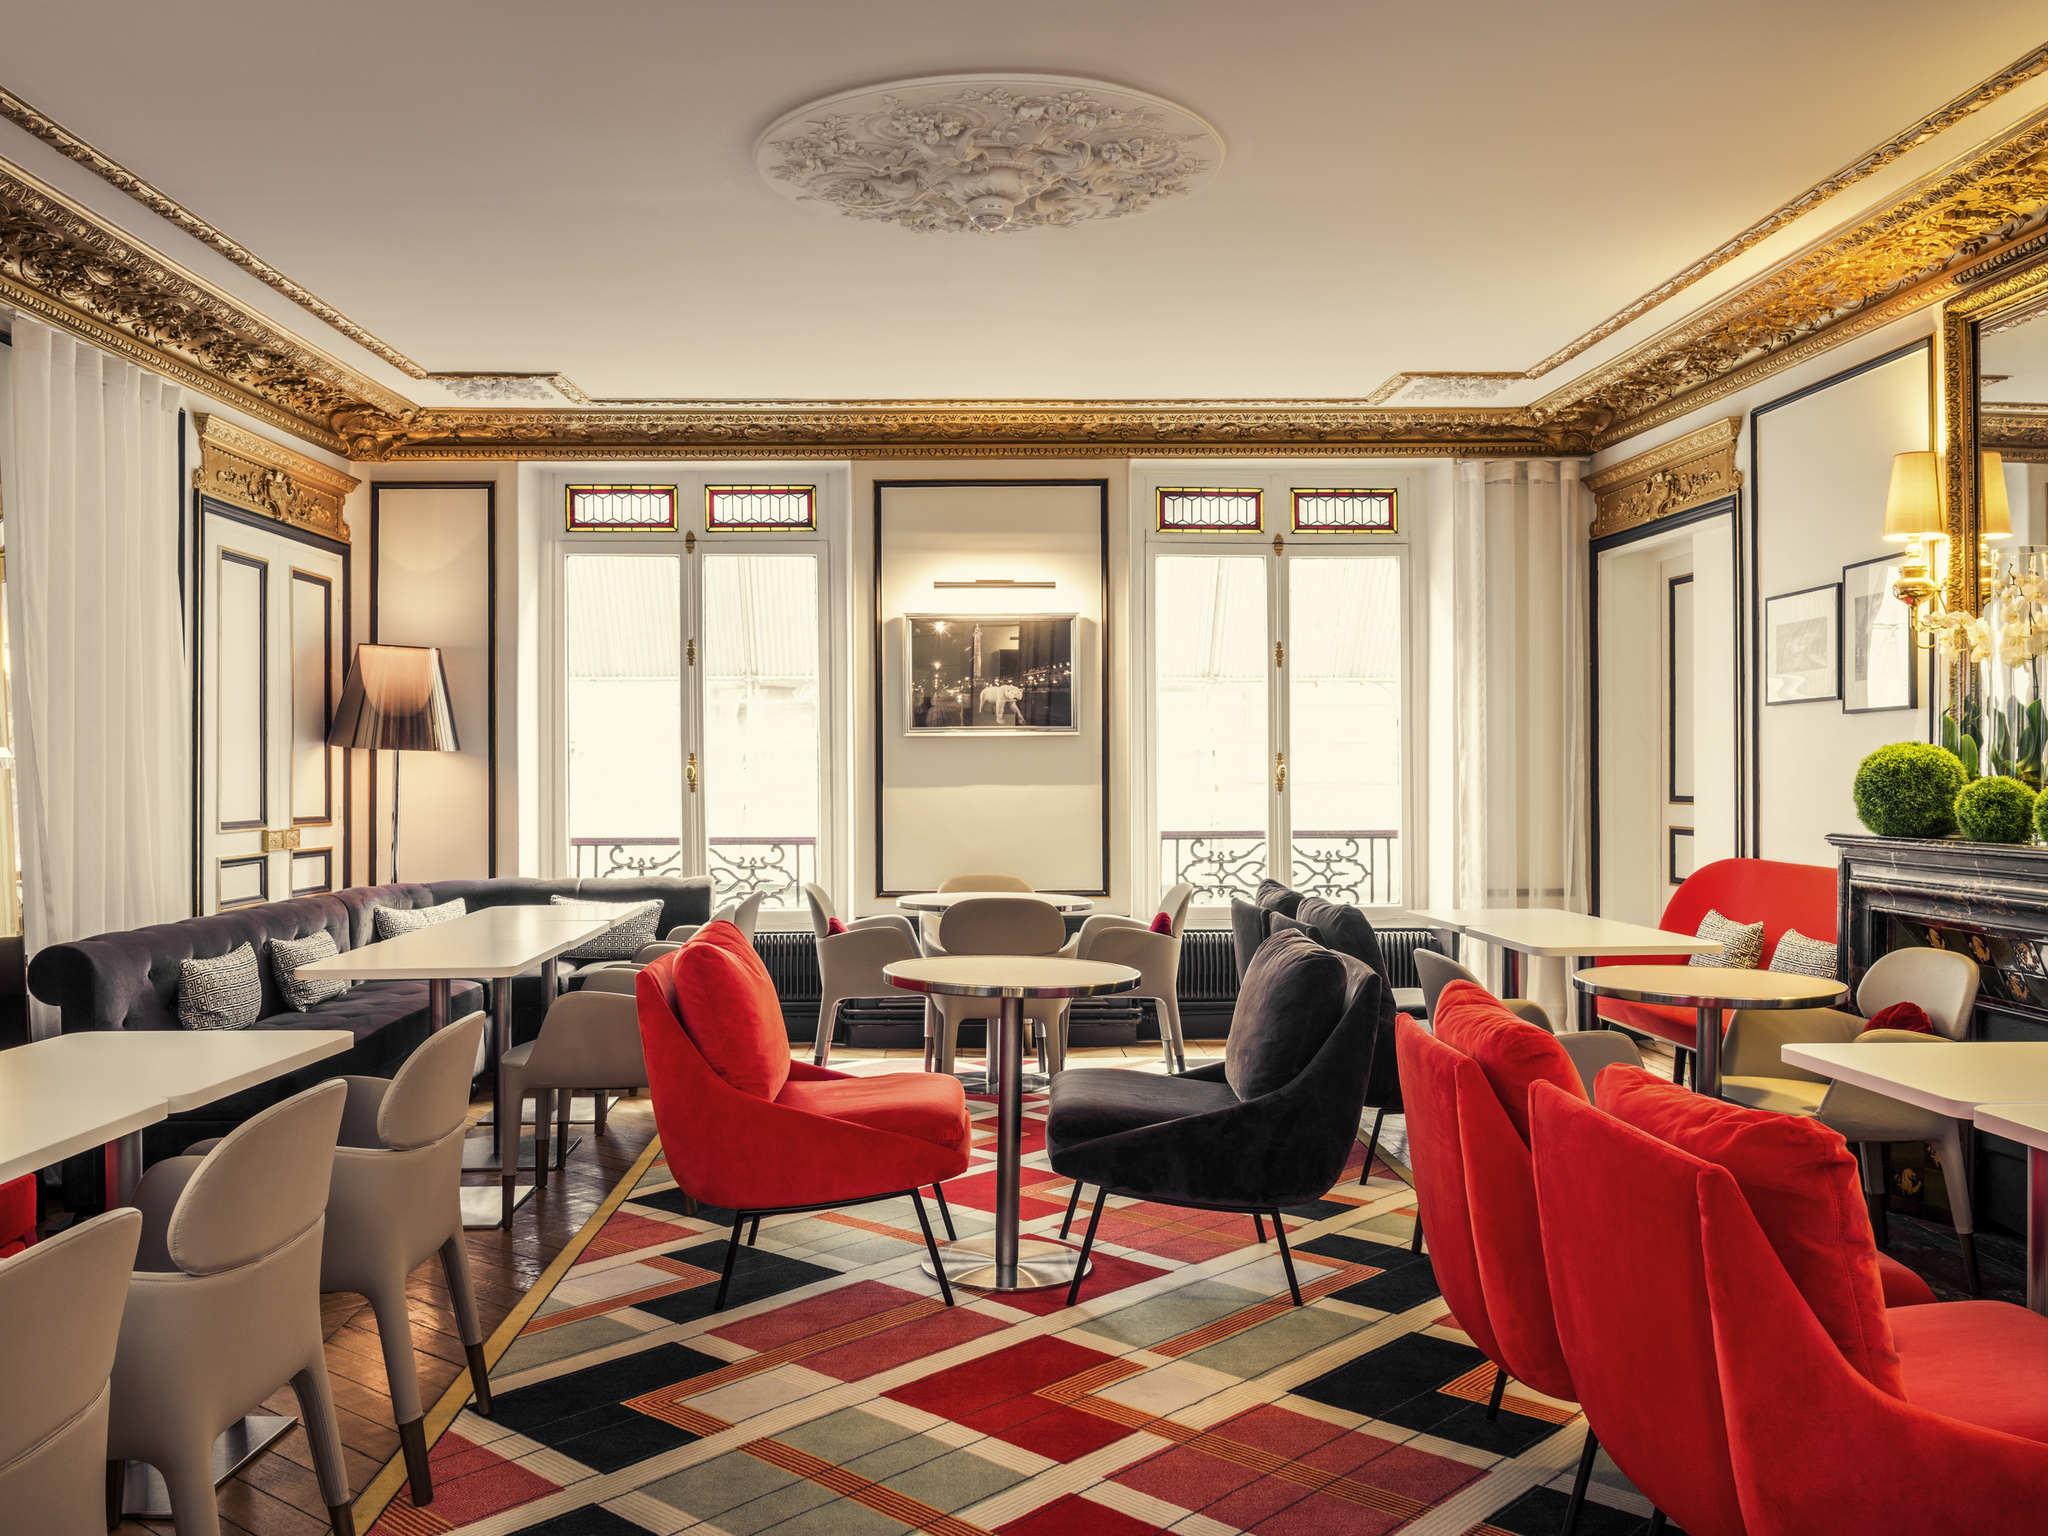 Hotel – Hotel Mercure Paris Opéra Louvre